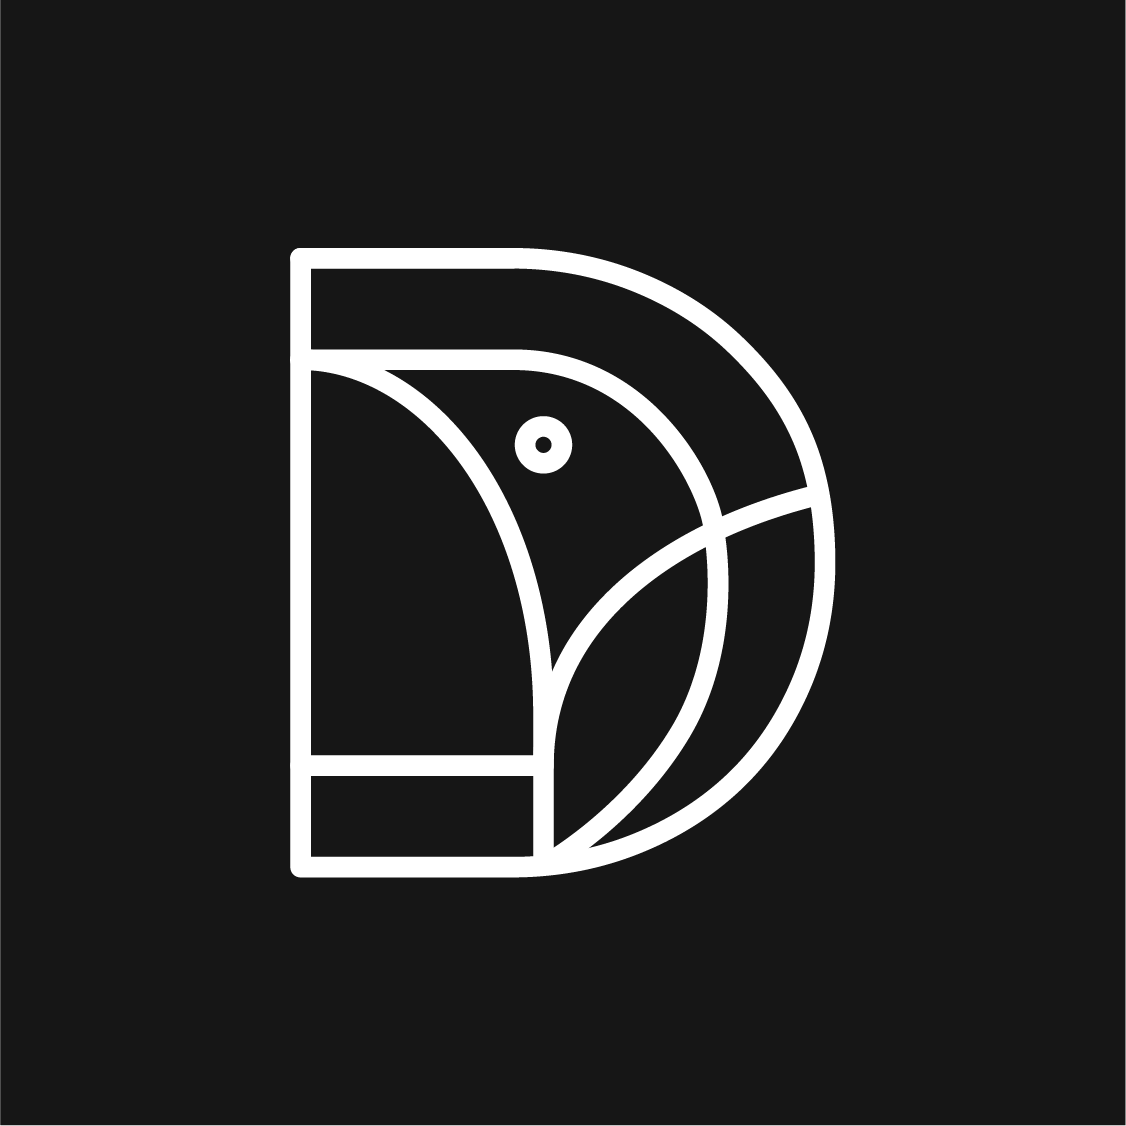 all-logos-2020-87